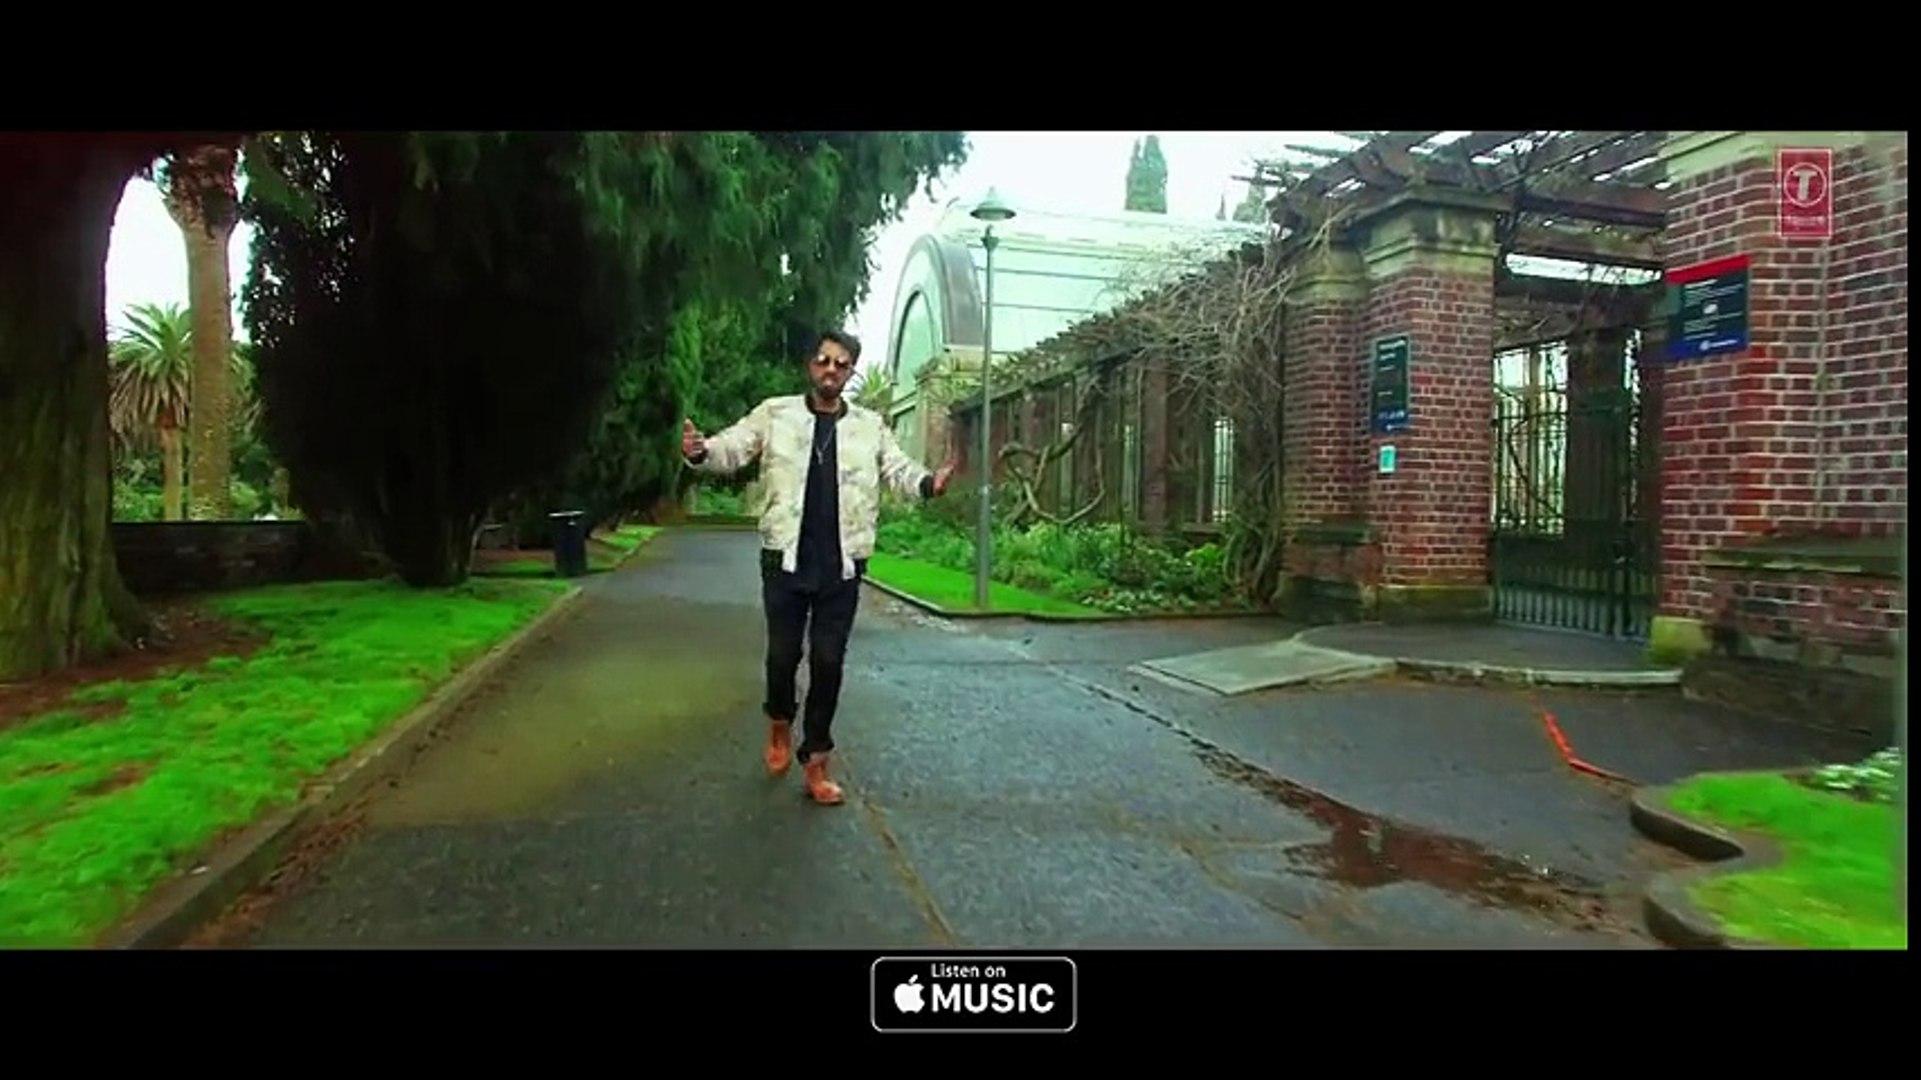 Tiara Johny Seth Ft Pardhaan (Full Song) Avvy Sra  Bhavi Latest Punjabi Songs 2017